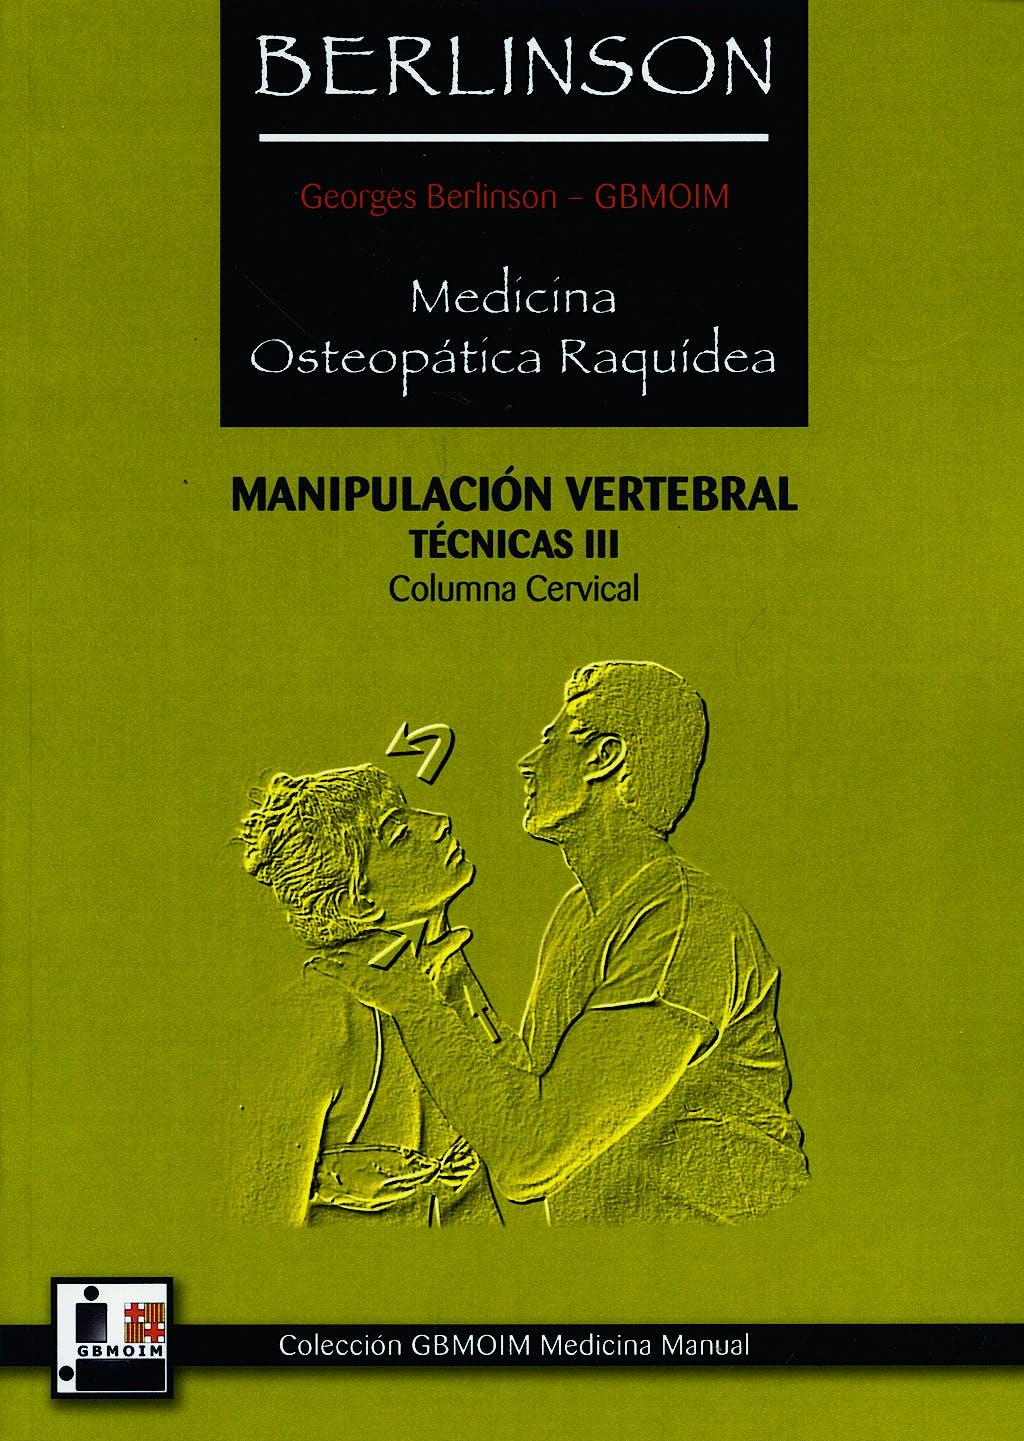 Portada del libro 9788420304700 Medicina Osteopática Raquídea: Manipulación Vertebral, Técnicas III: Columna Cervical